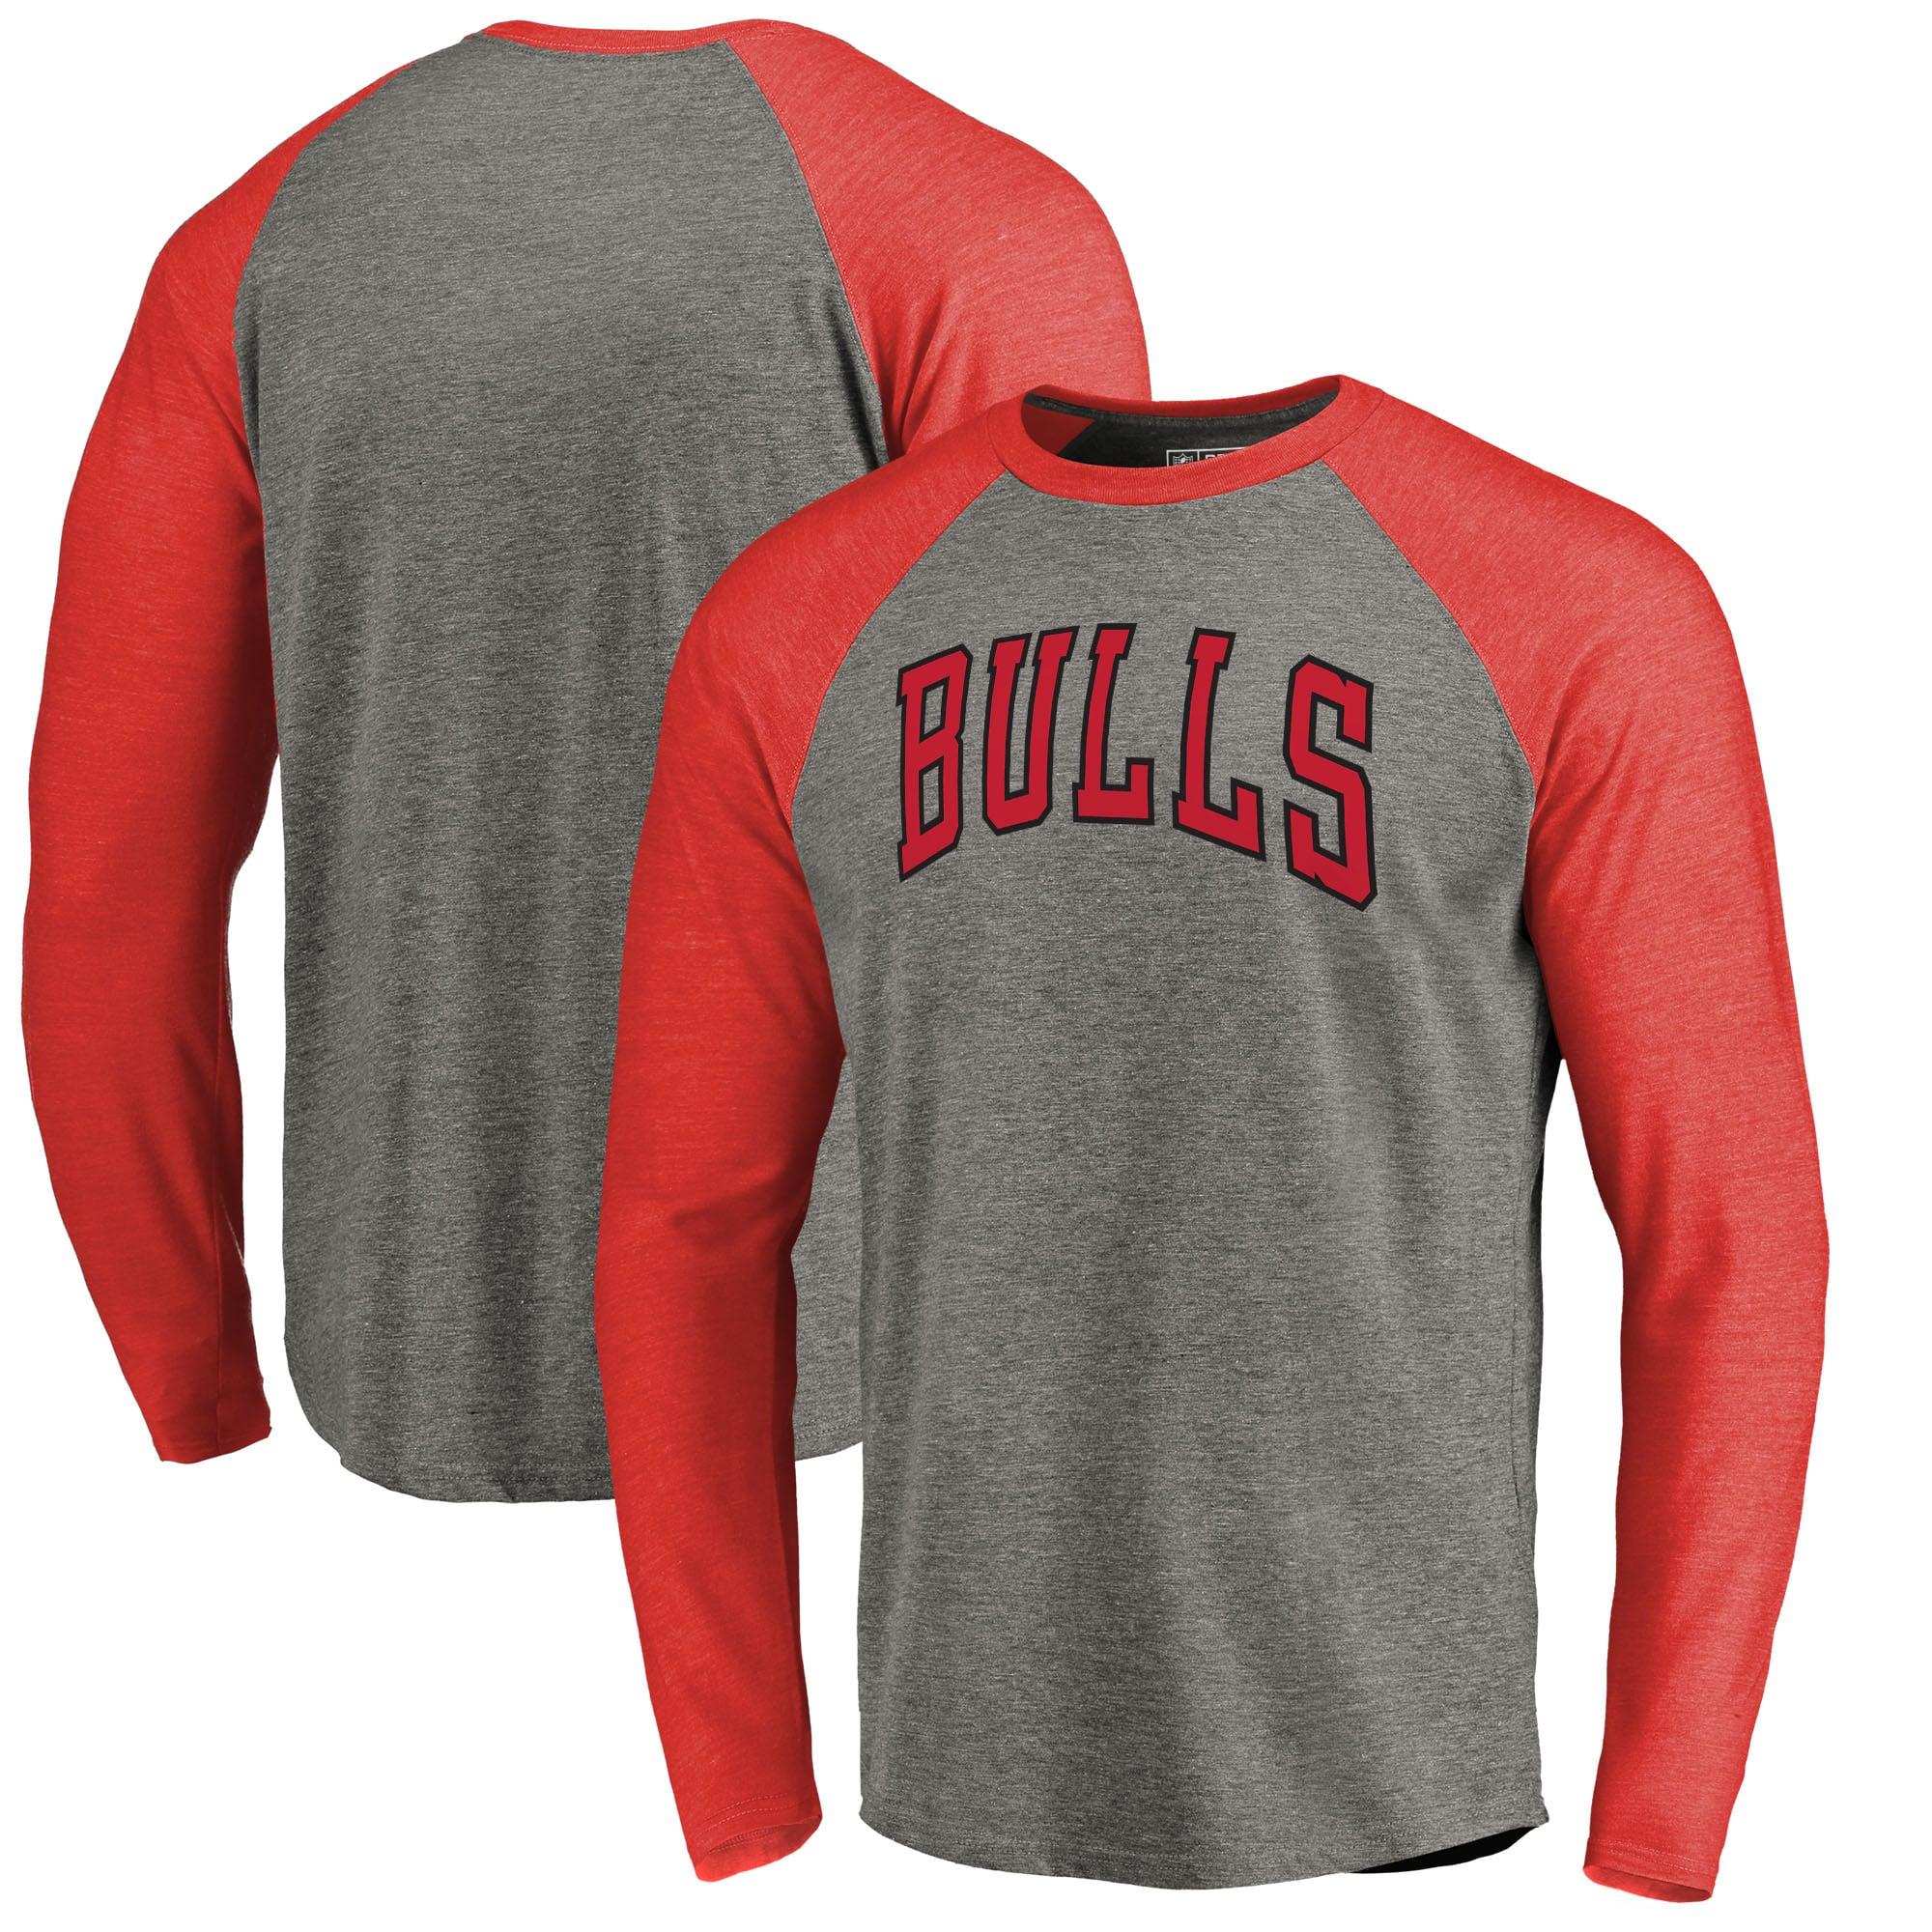 Chicago Bulls Fanatics Branded Primary Wordmark Tri-Blend Long Sleeve T-Shirt - Heathered Gray